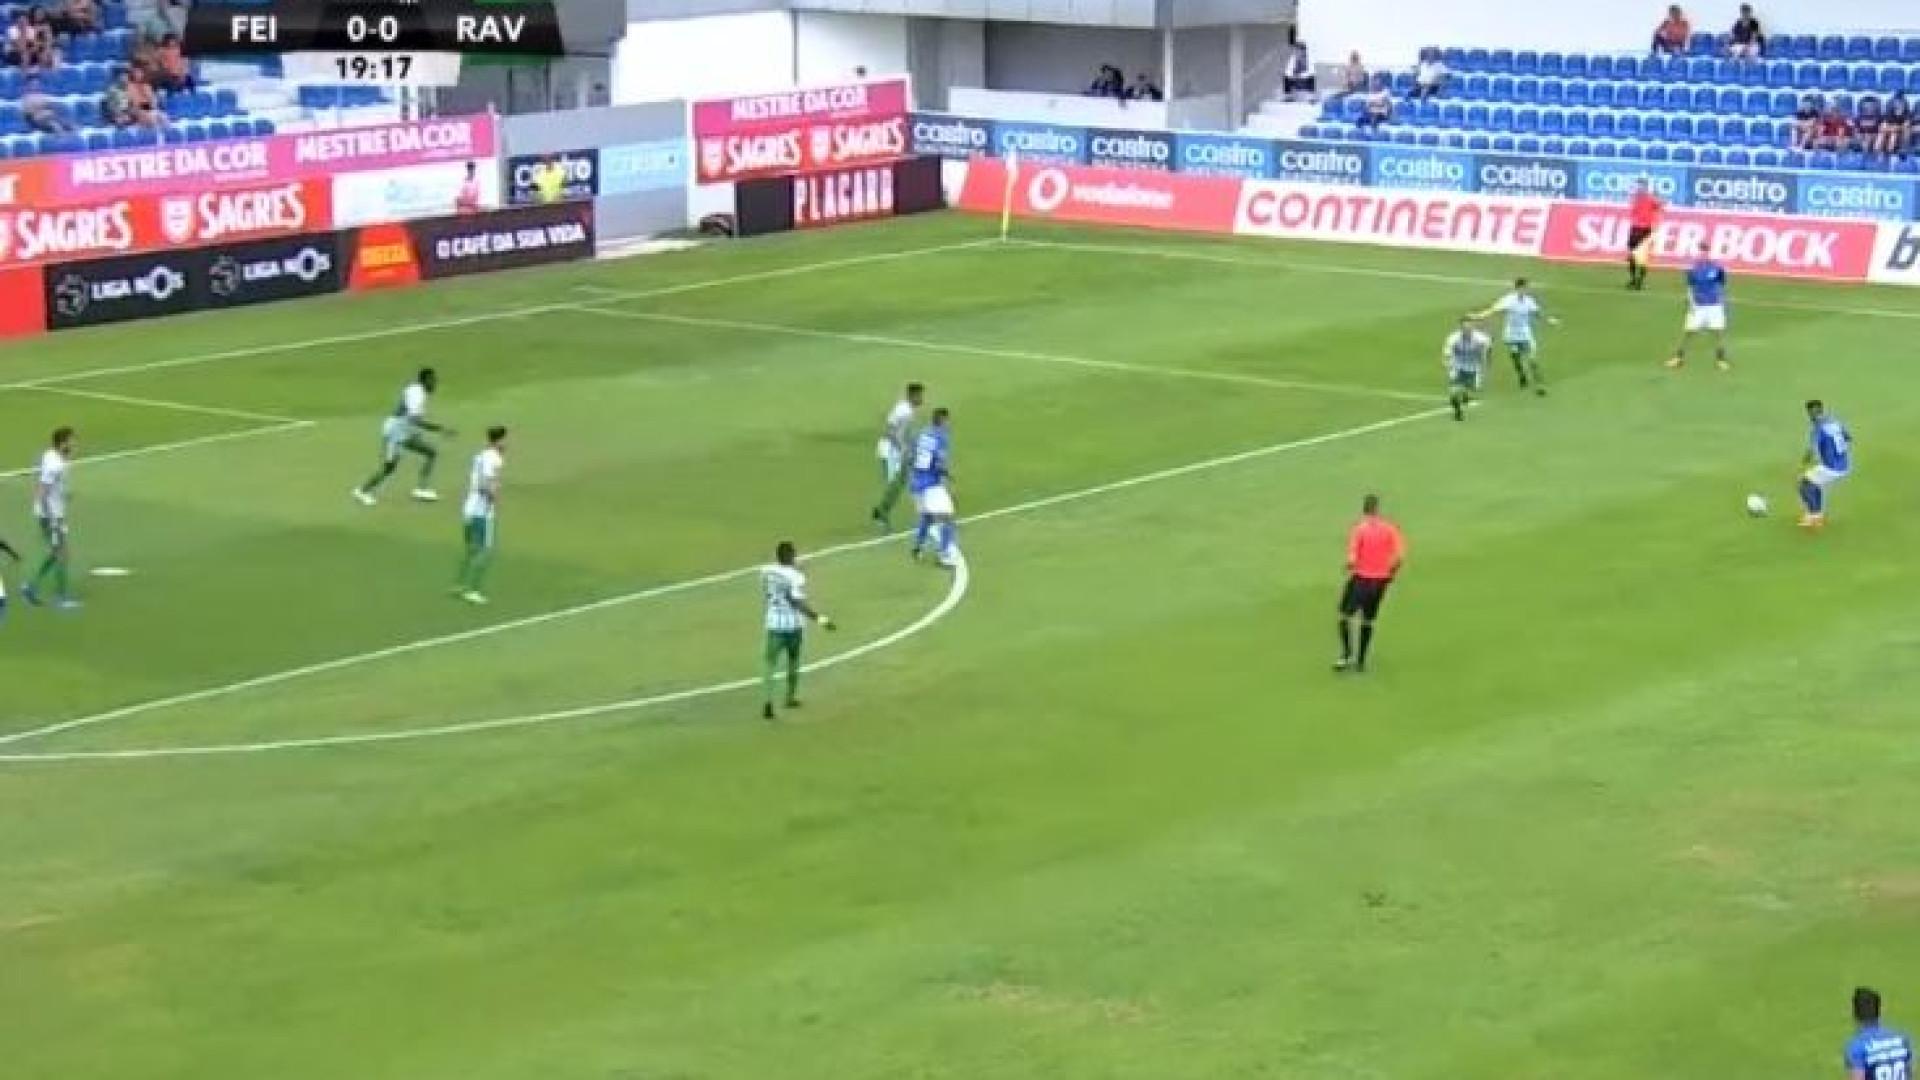 De fora de área, Tiago Silva rematou para o 1-0